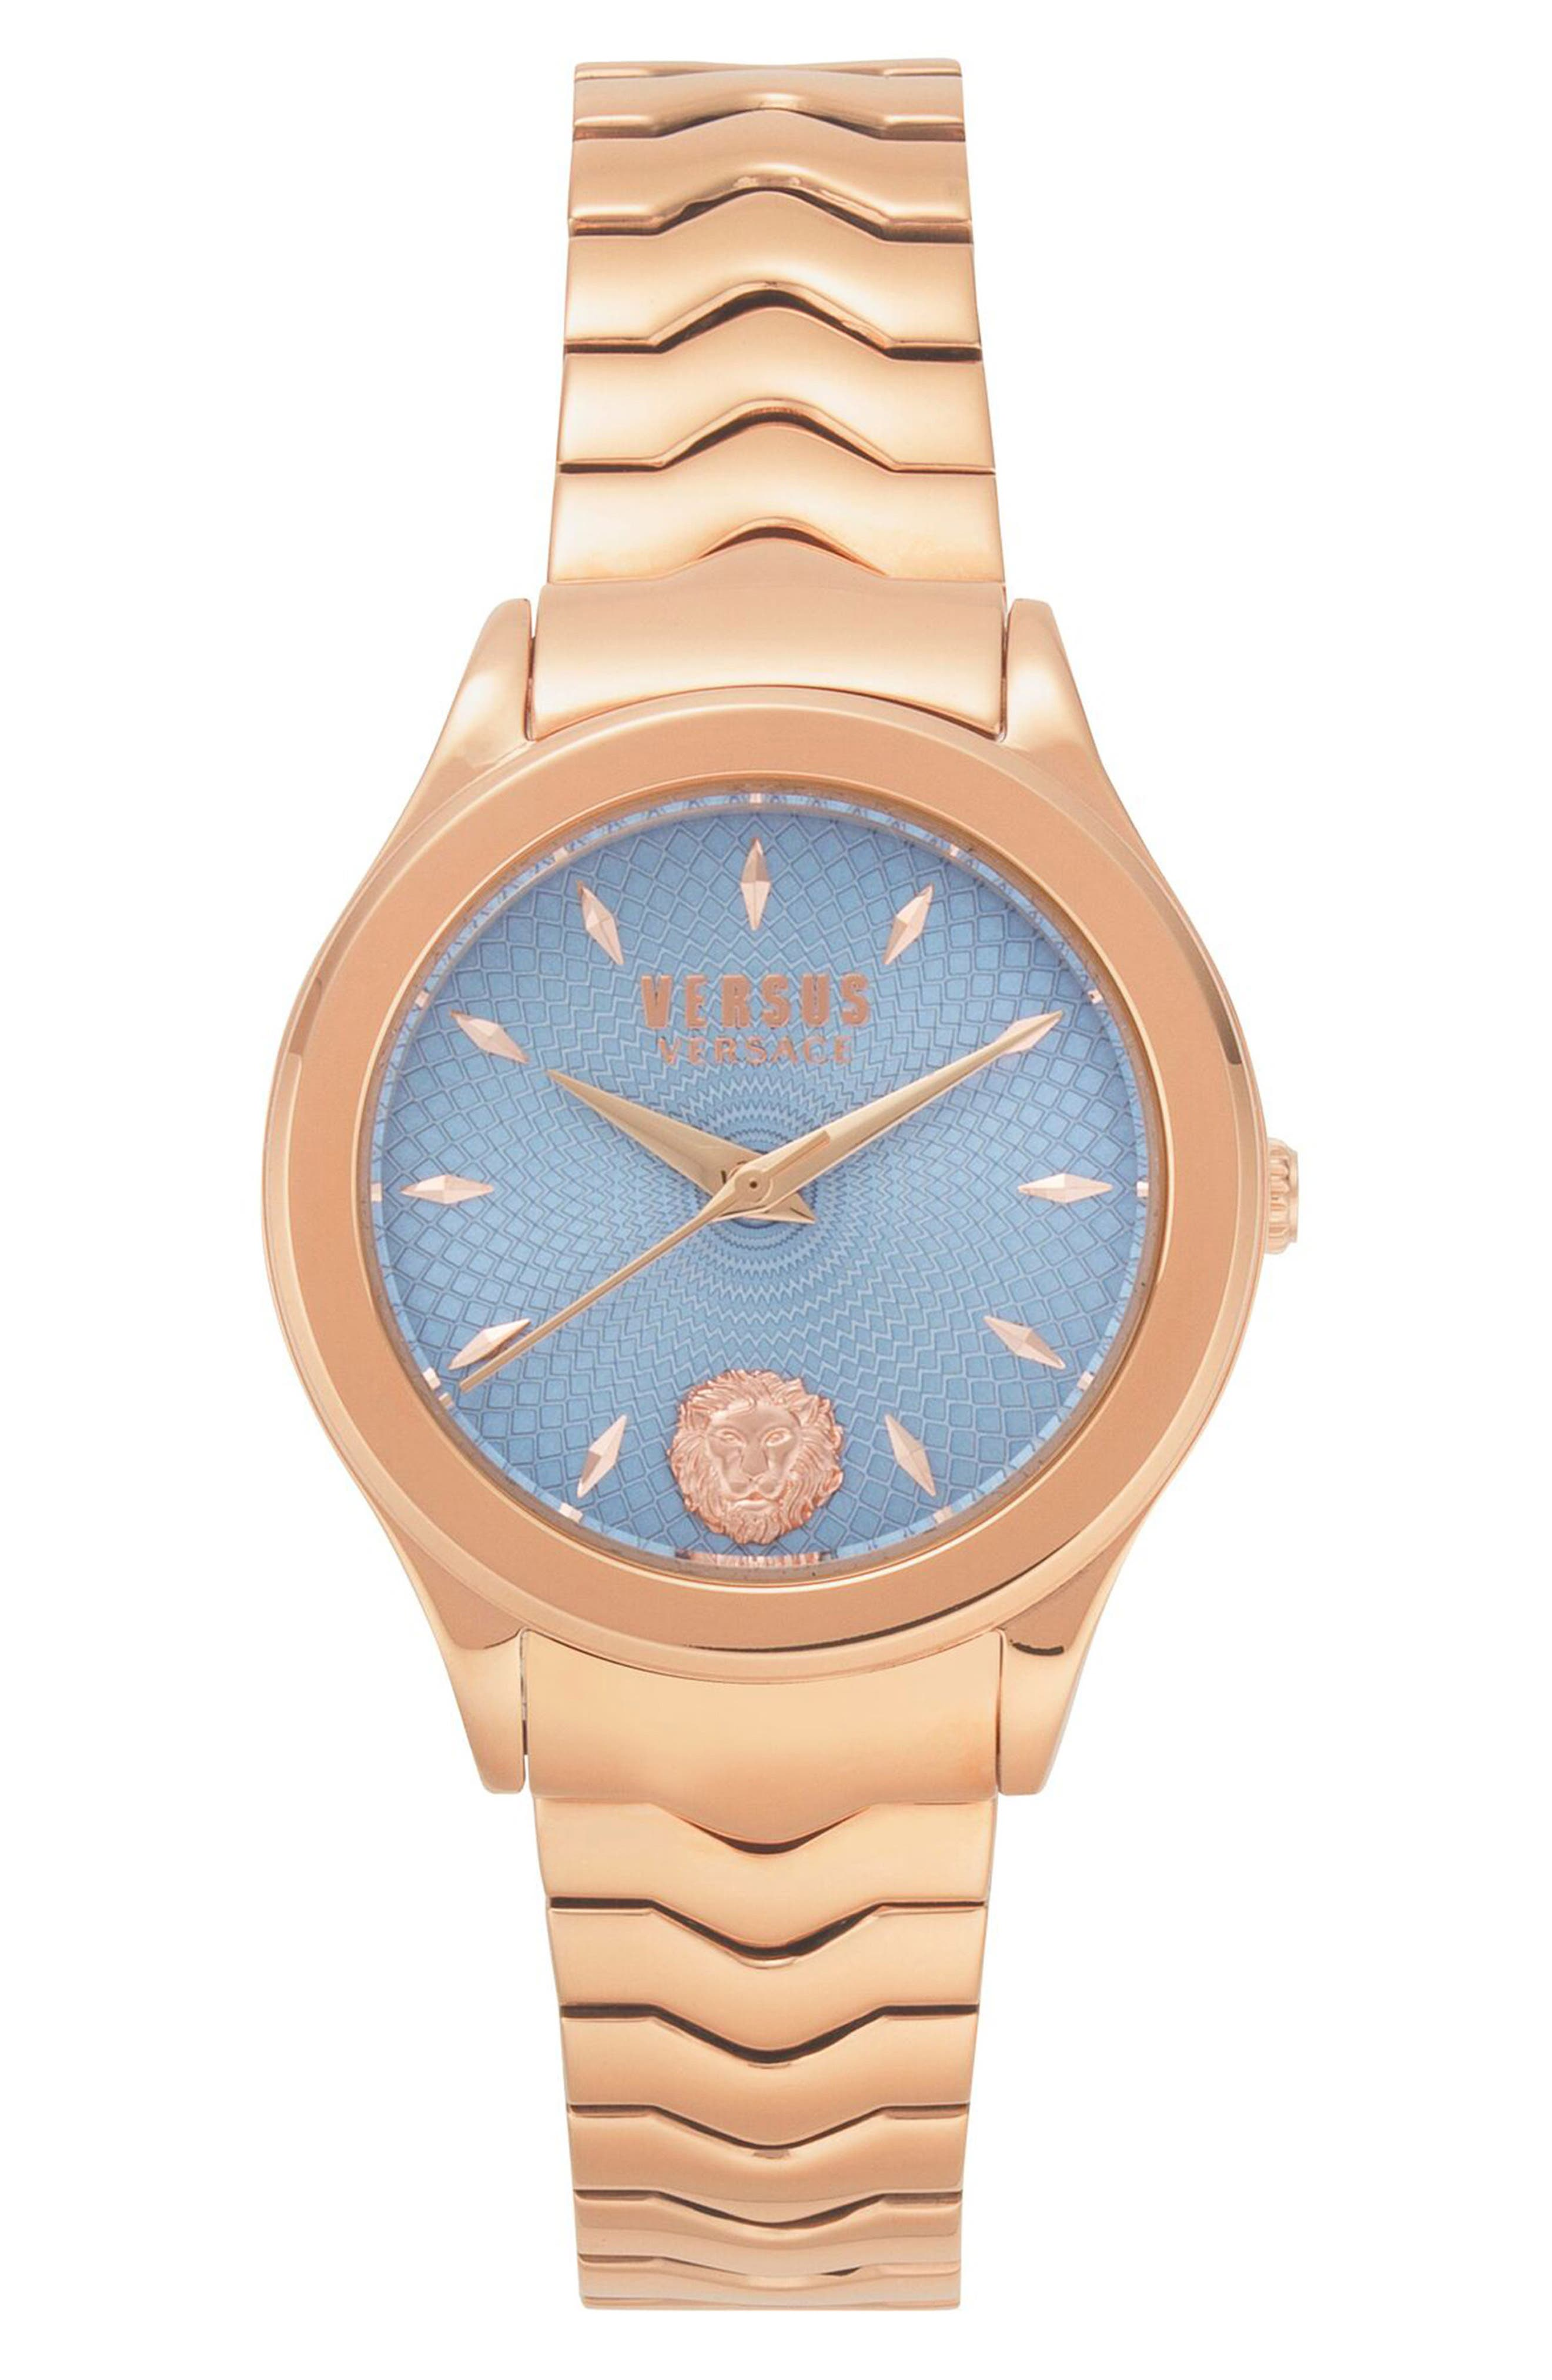 VERSUS VERSACE Mount Pleasant Bracelet Watch, 34mm, Main, color, ROSE GOLD/ BLUE/ ROSE GOLD